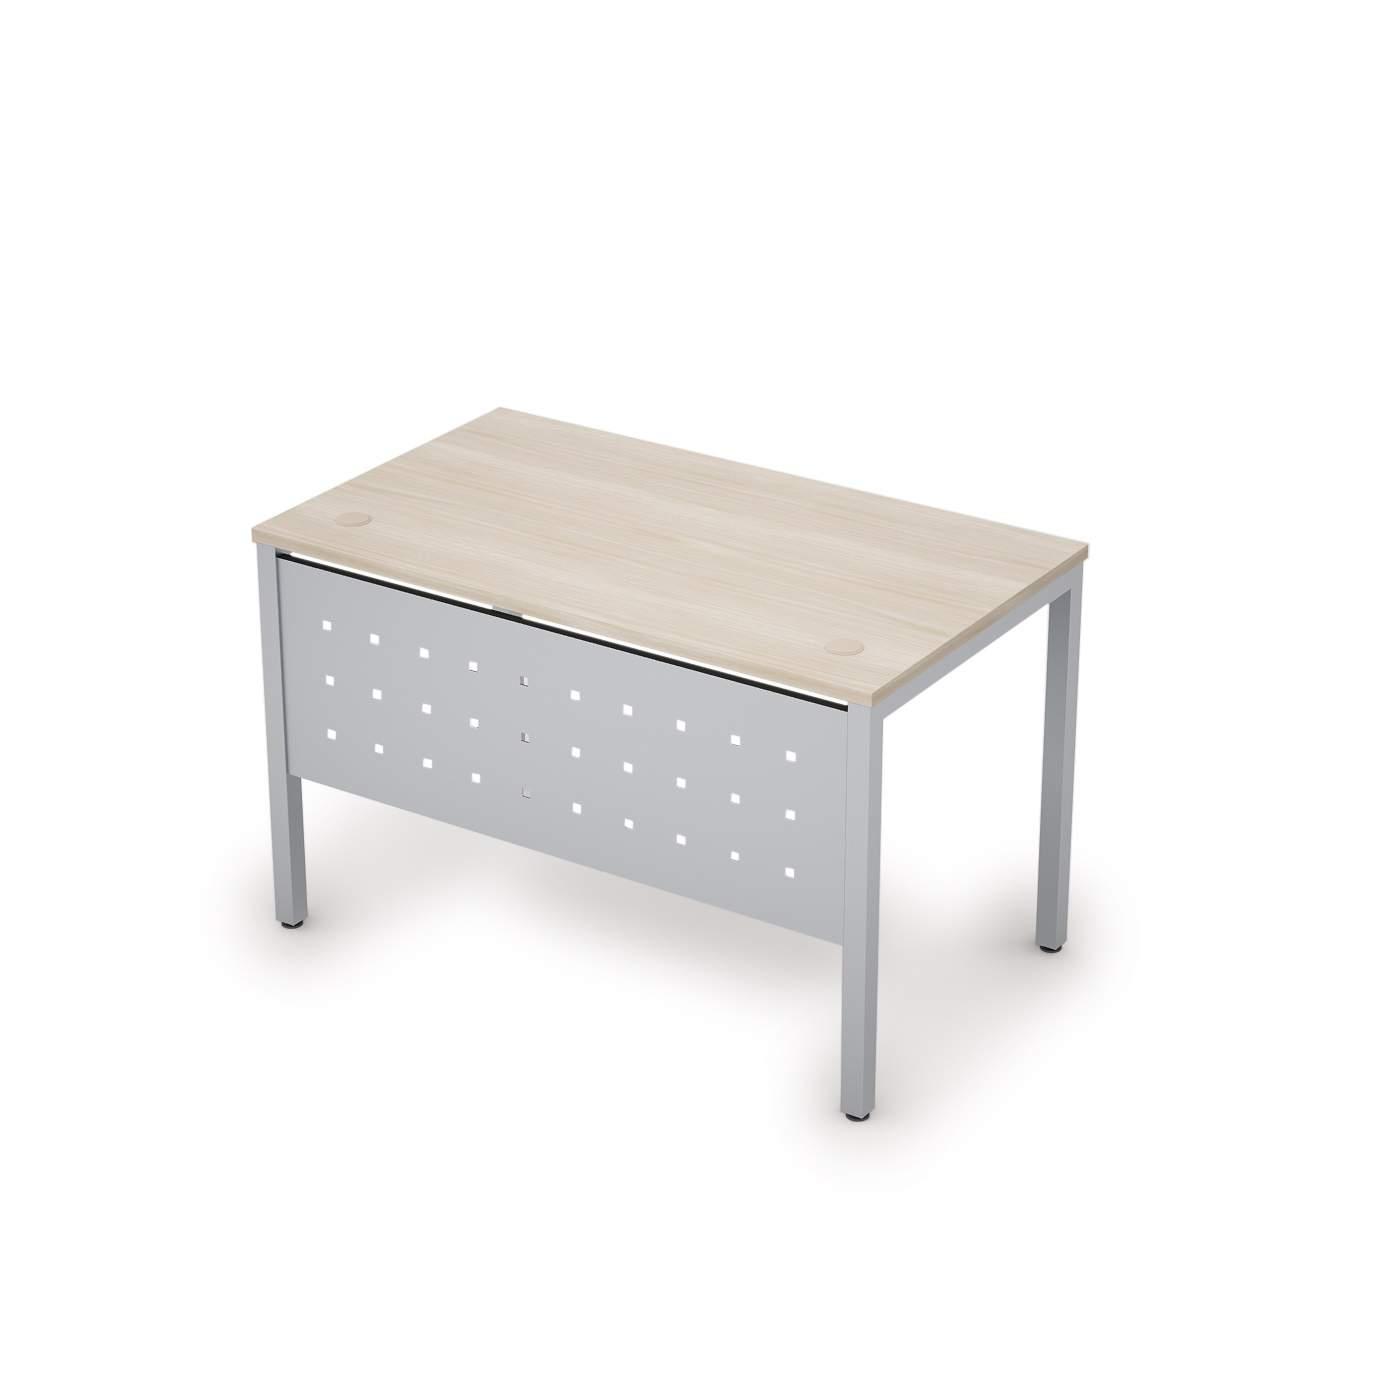 Стол с экраном из металла 1200х700х750